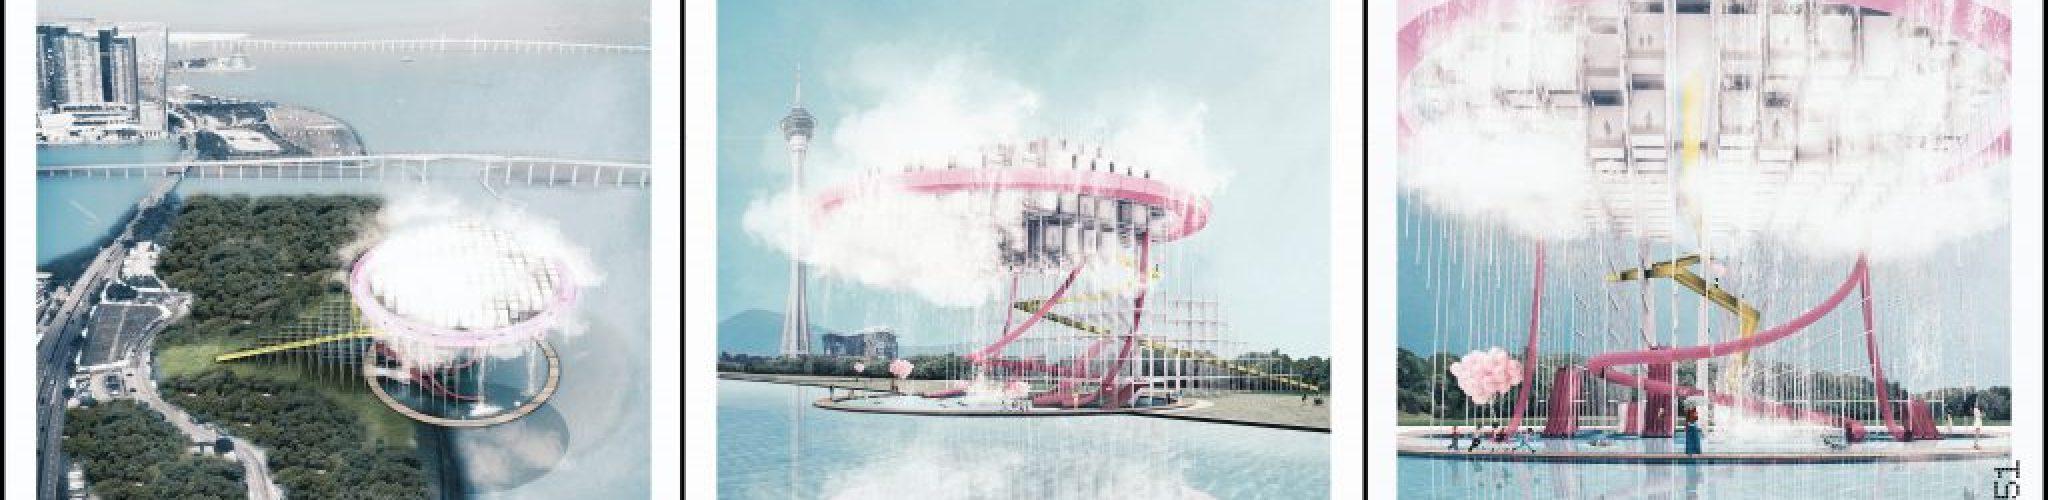 Macau Cloud Pavilion